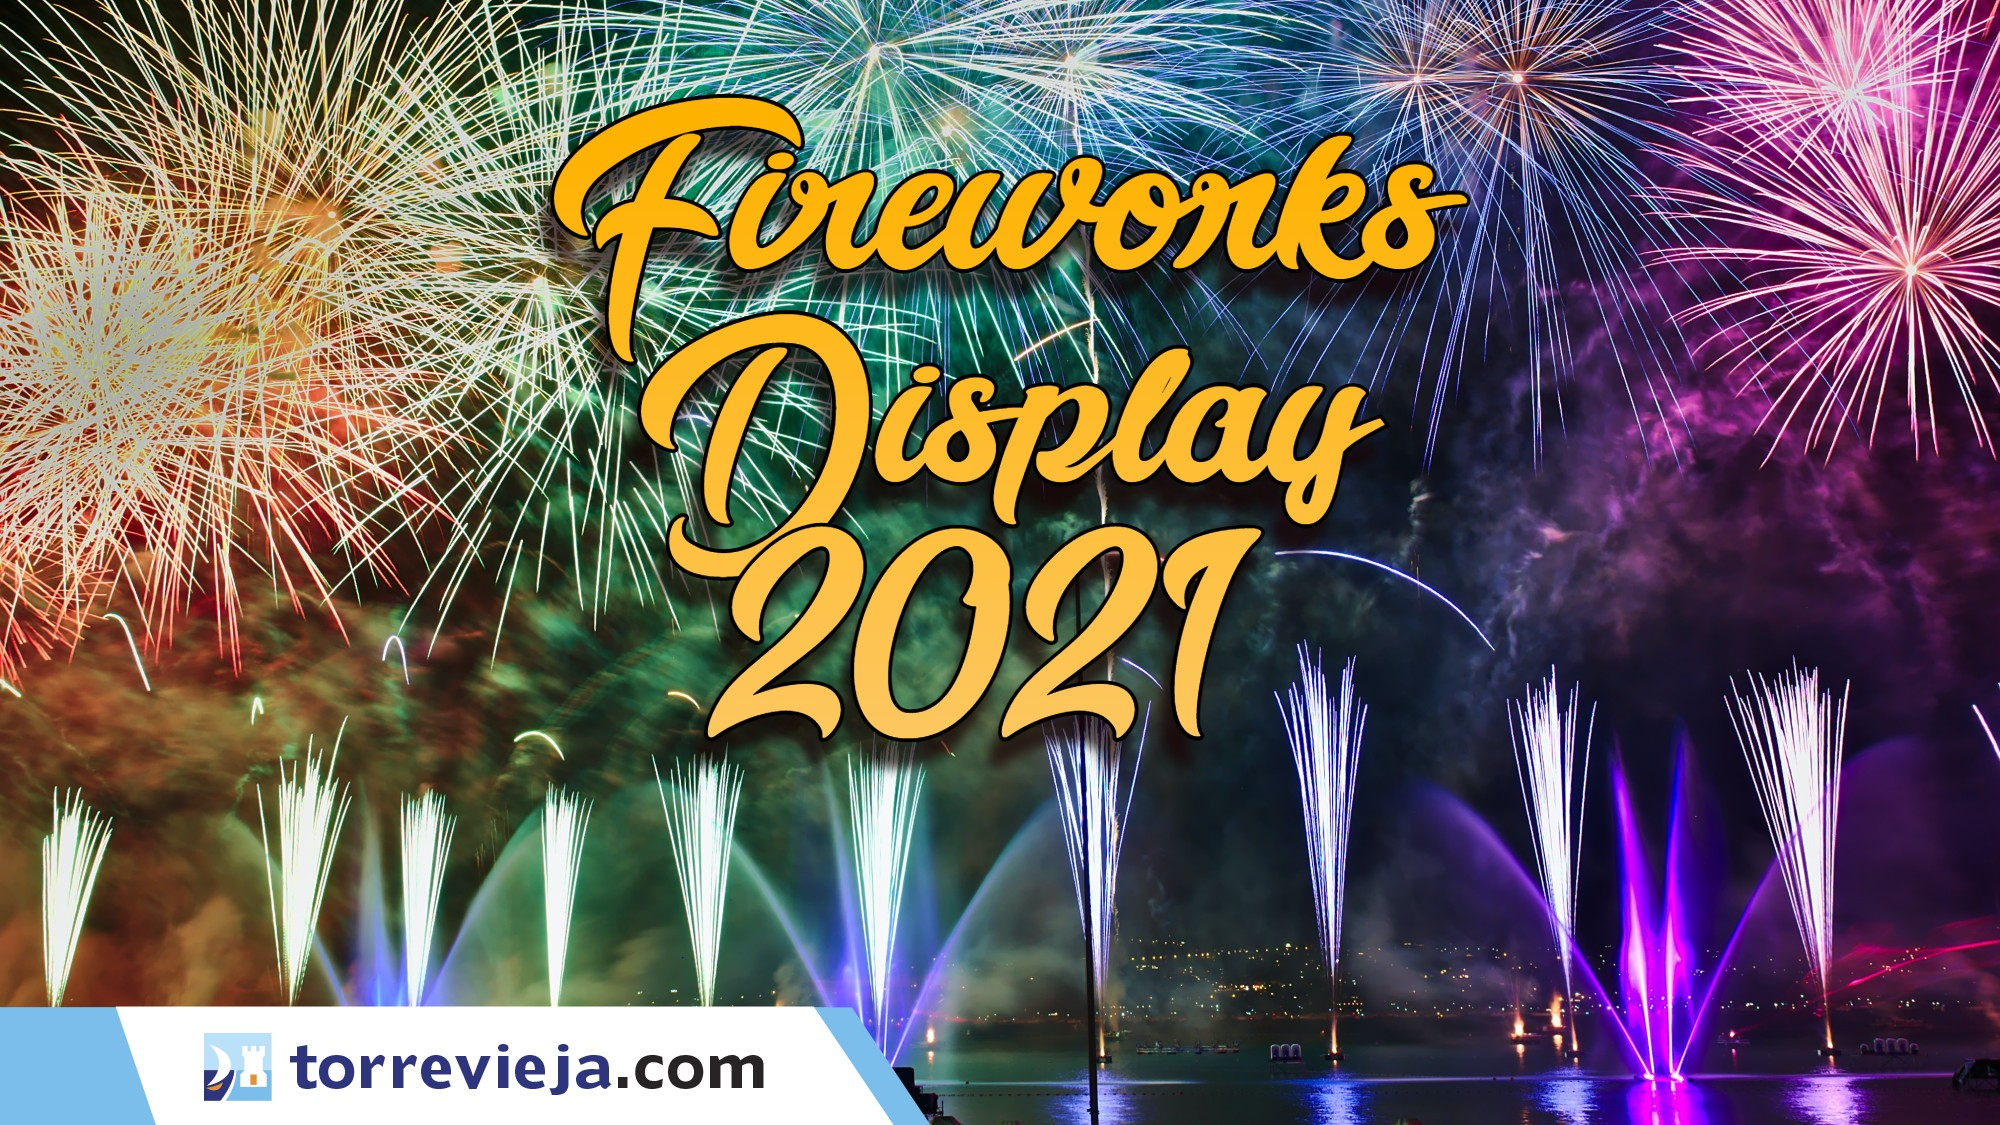 Fireworks Display Torrevieja 2021